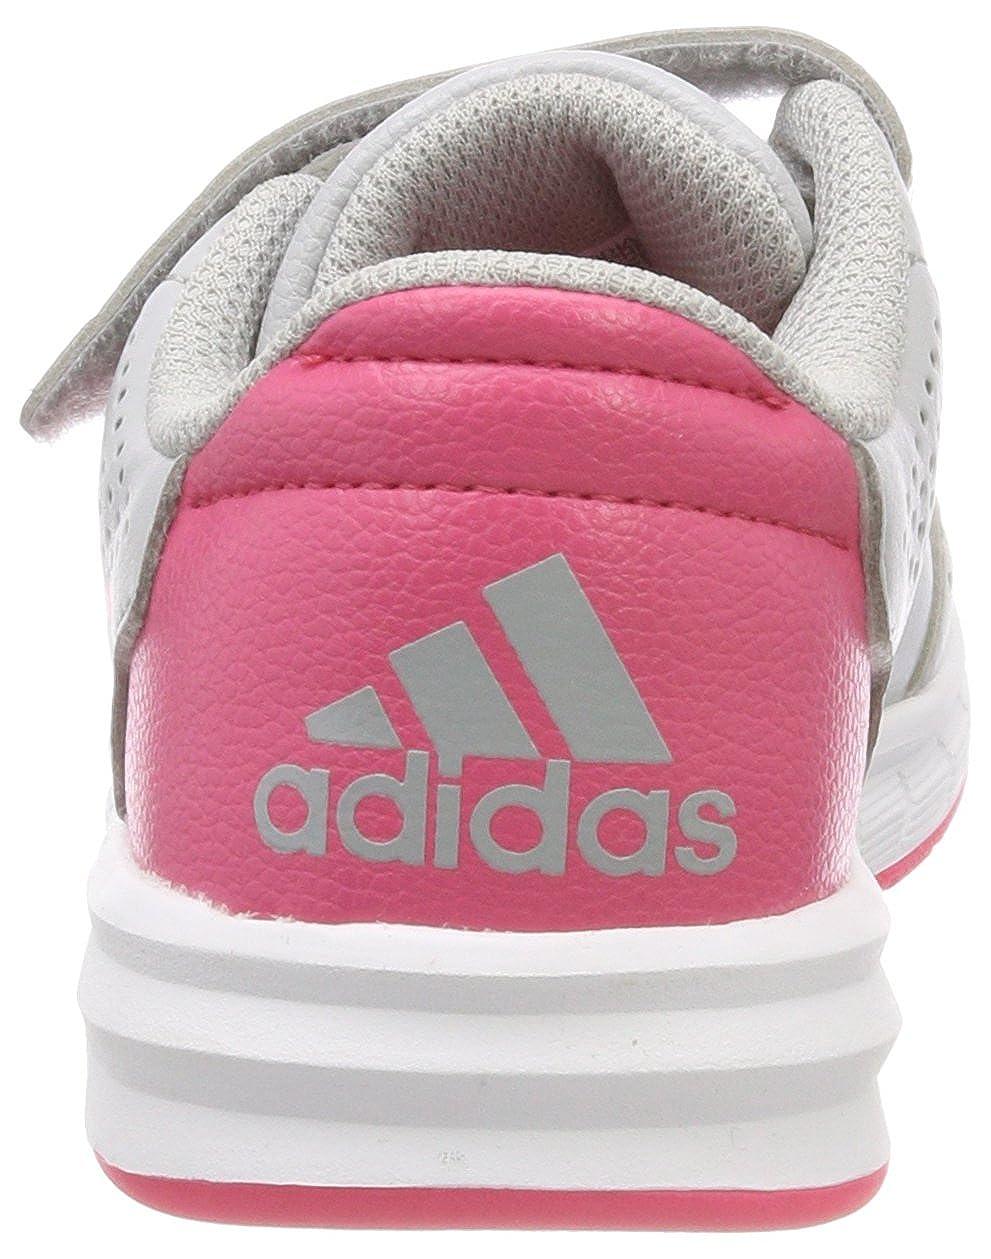 adidas AltaSport CF K Chaussures de Gymnastique Mixte Enfant